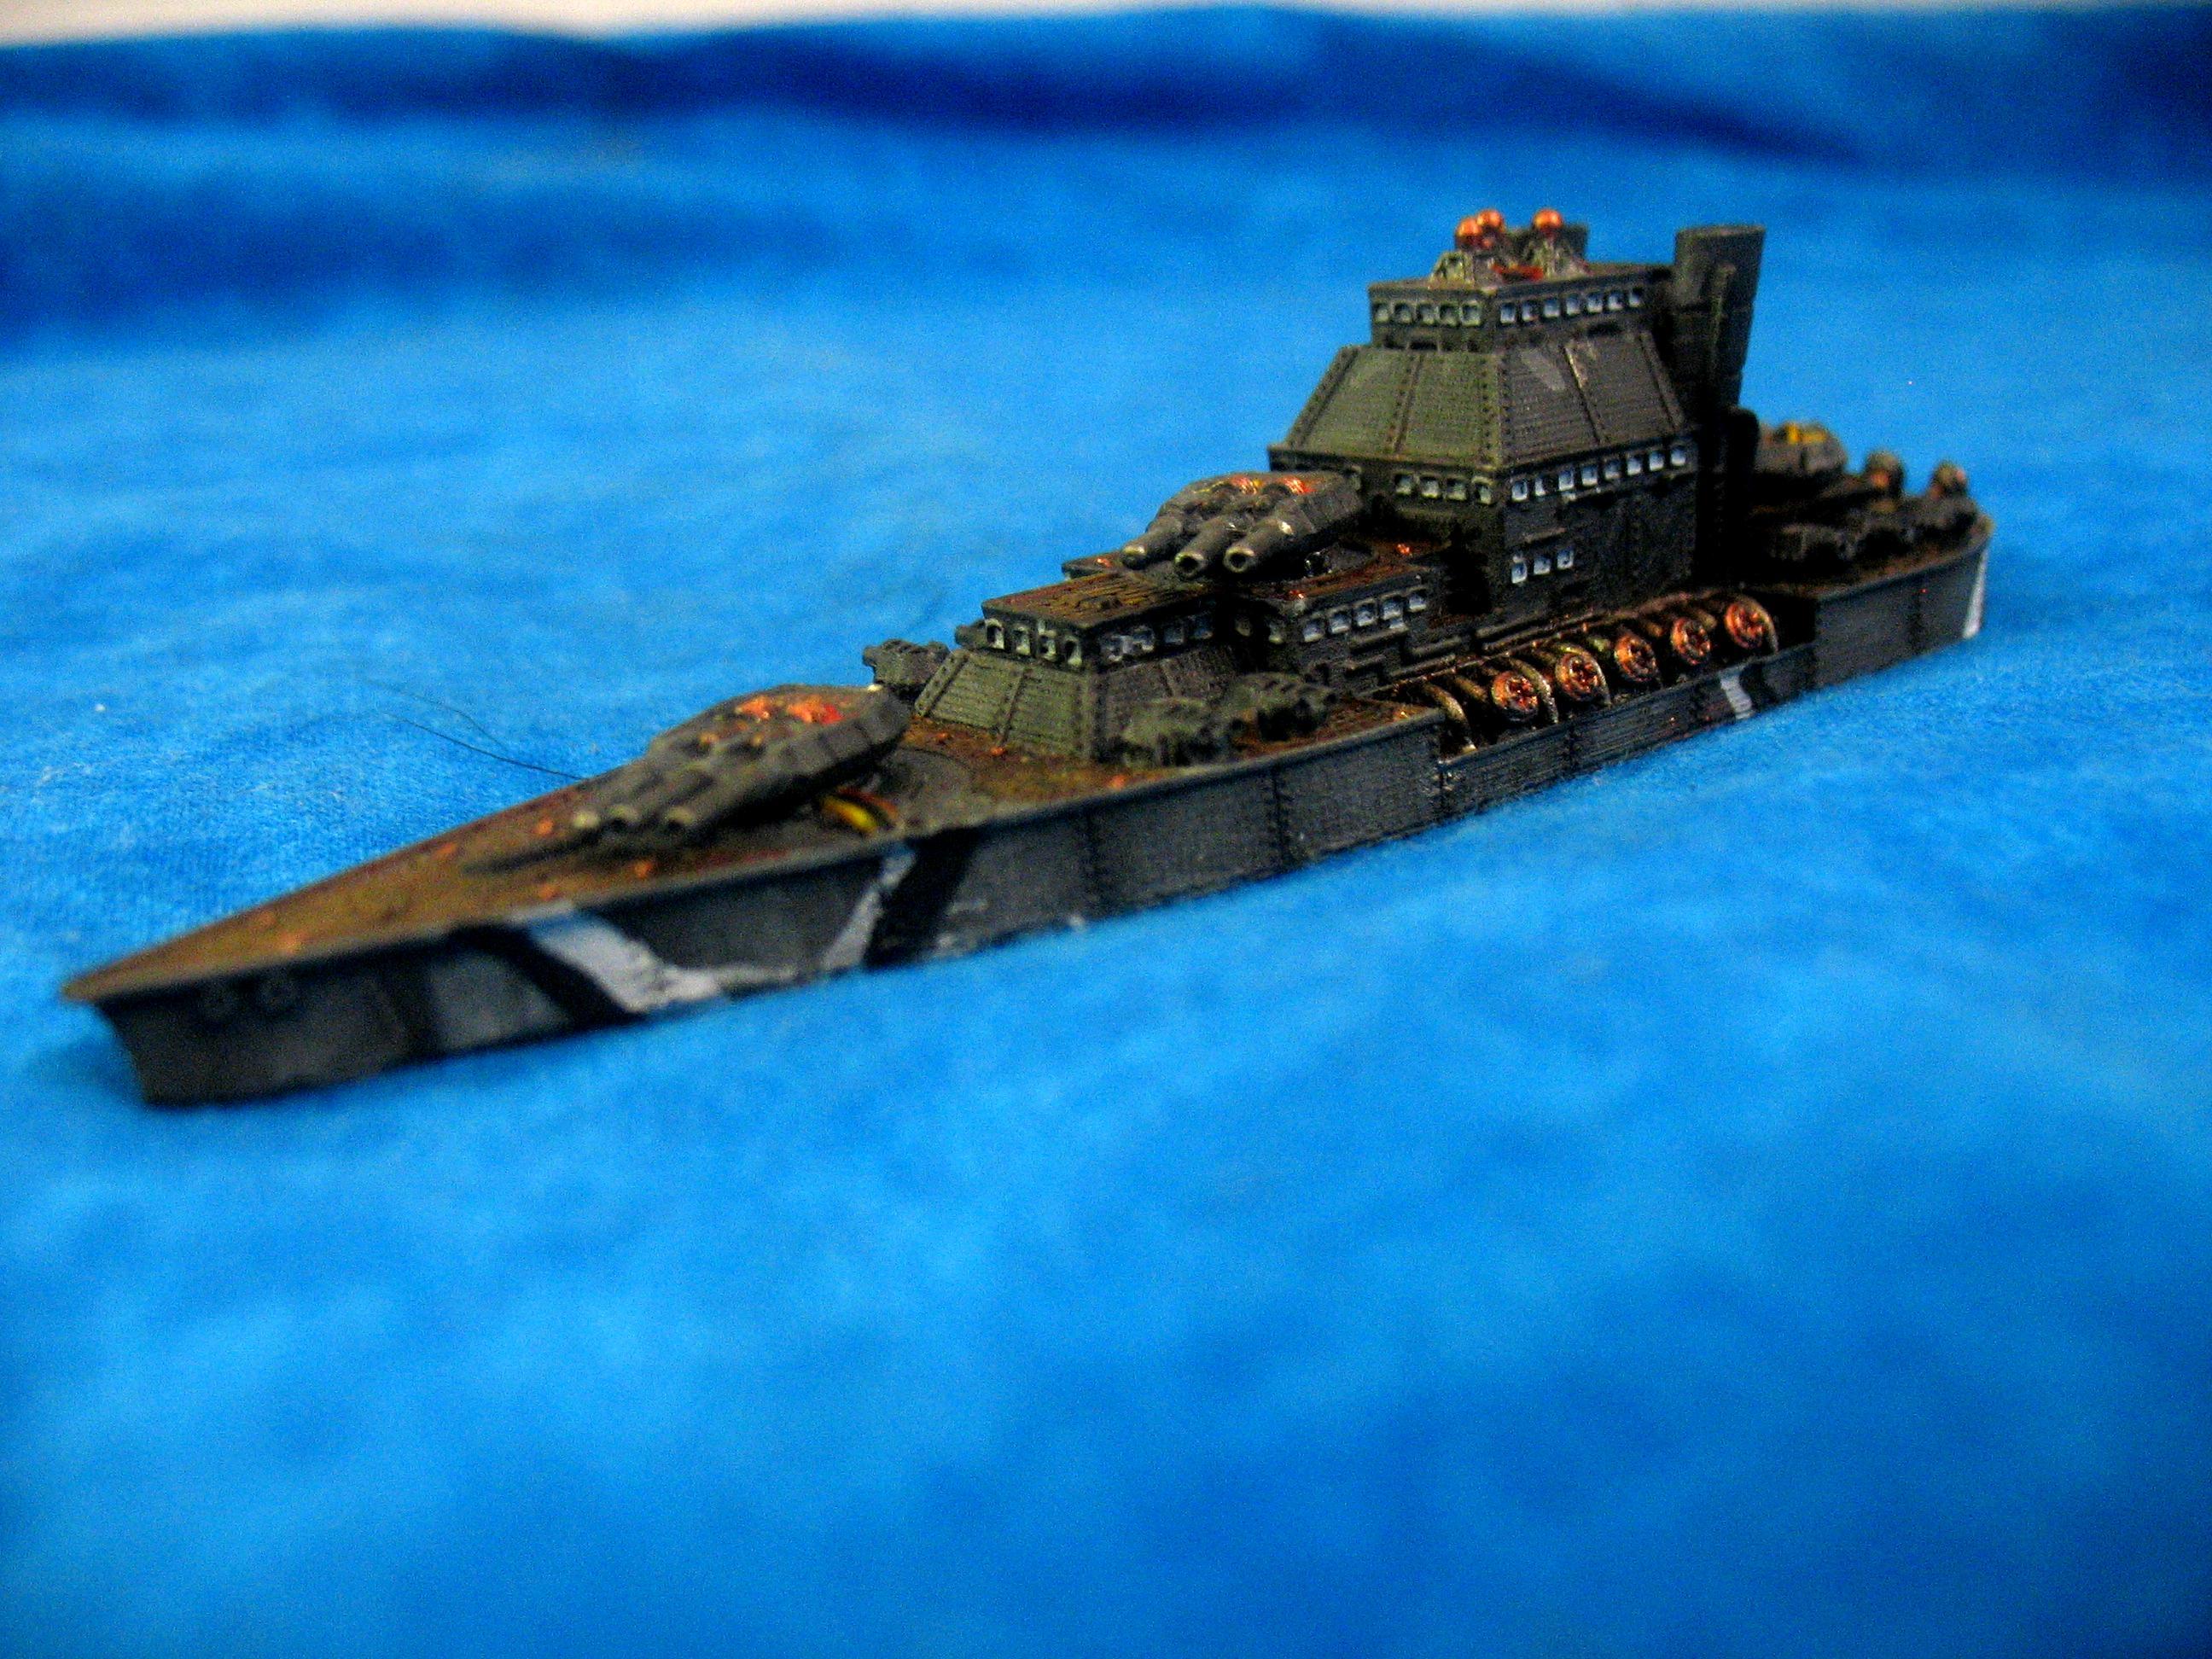 Battleship, Dystopian, Empire, Prussia, Prussian, Wars